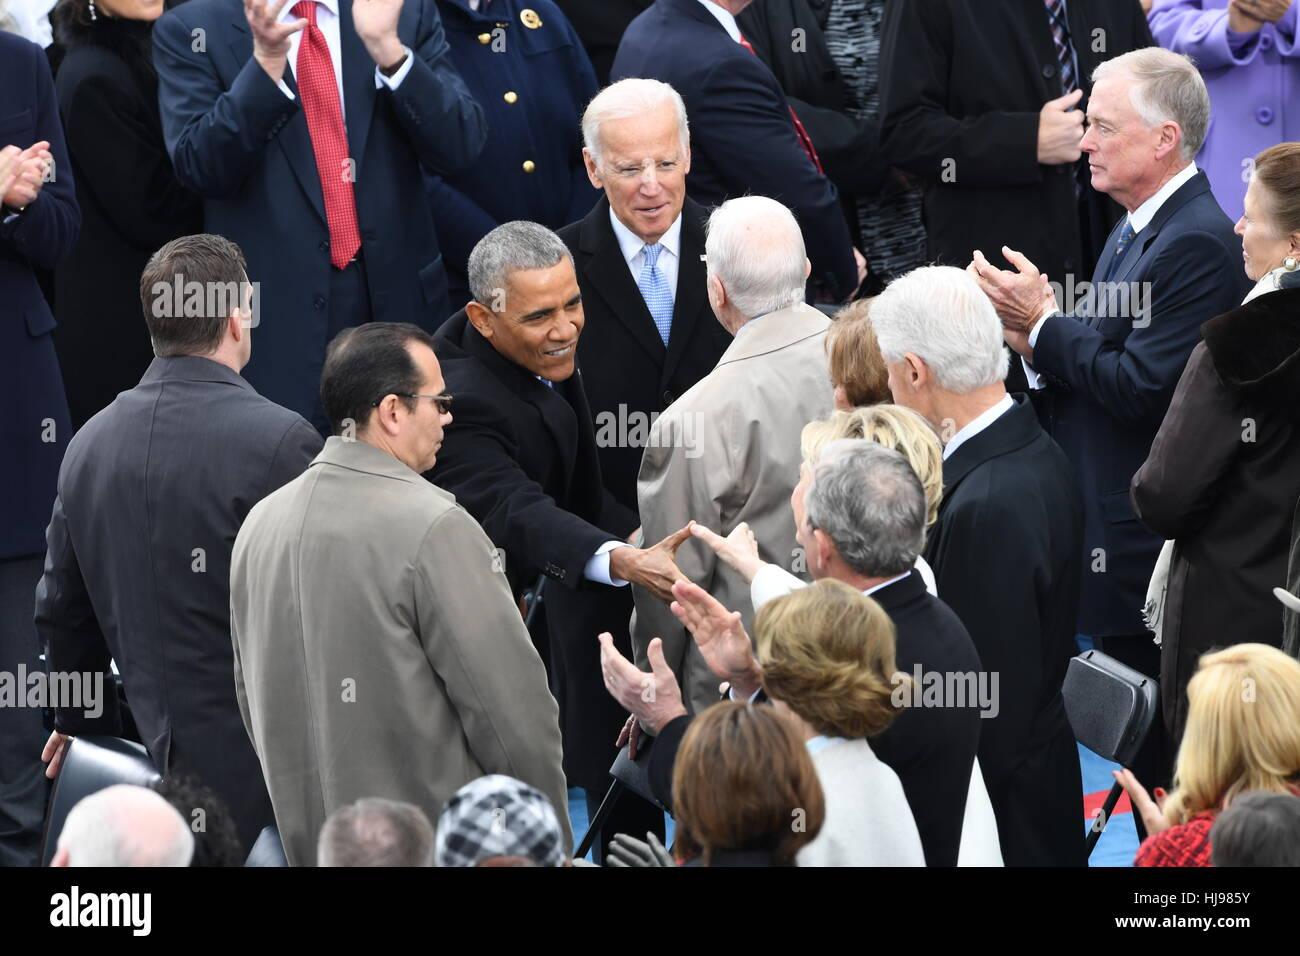 President Barack Obama Greets Former Secretary Of State Hillary